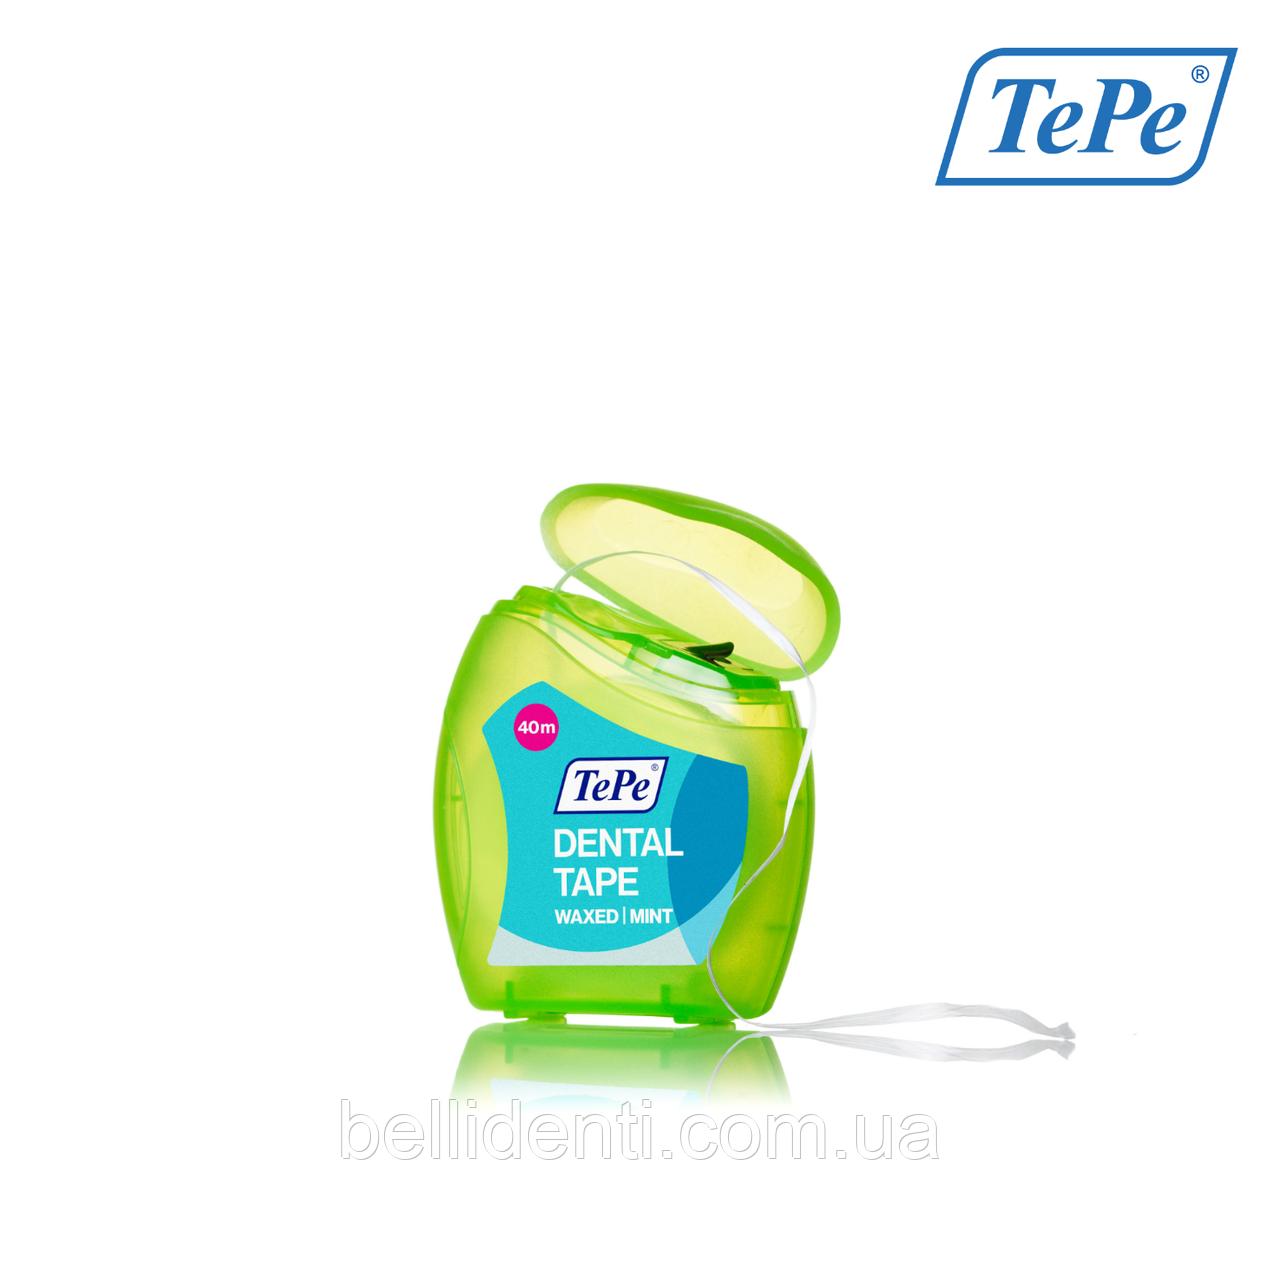 Зубная лента TePe Dental Tape, 40 м (тефлоновая)